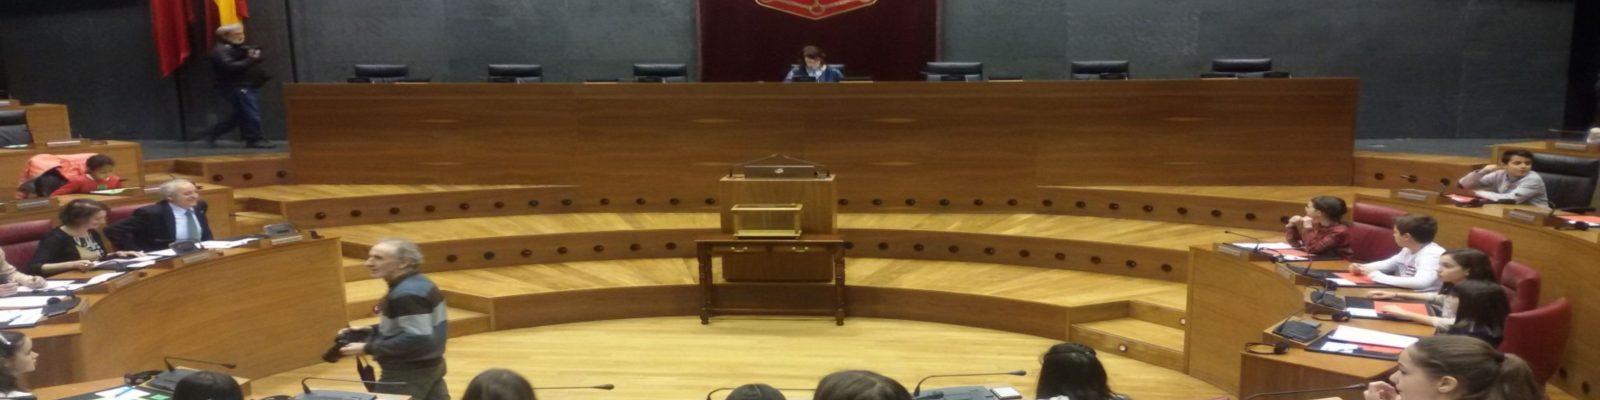 Parlamentarios por un Día